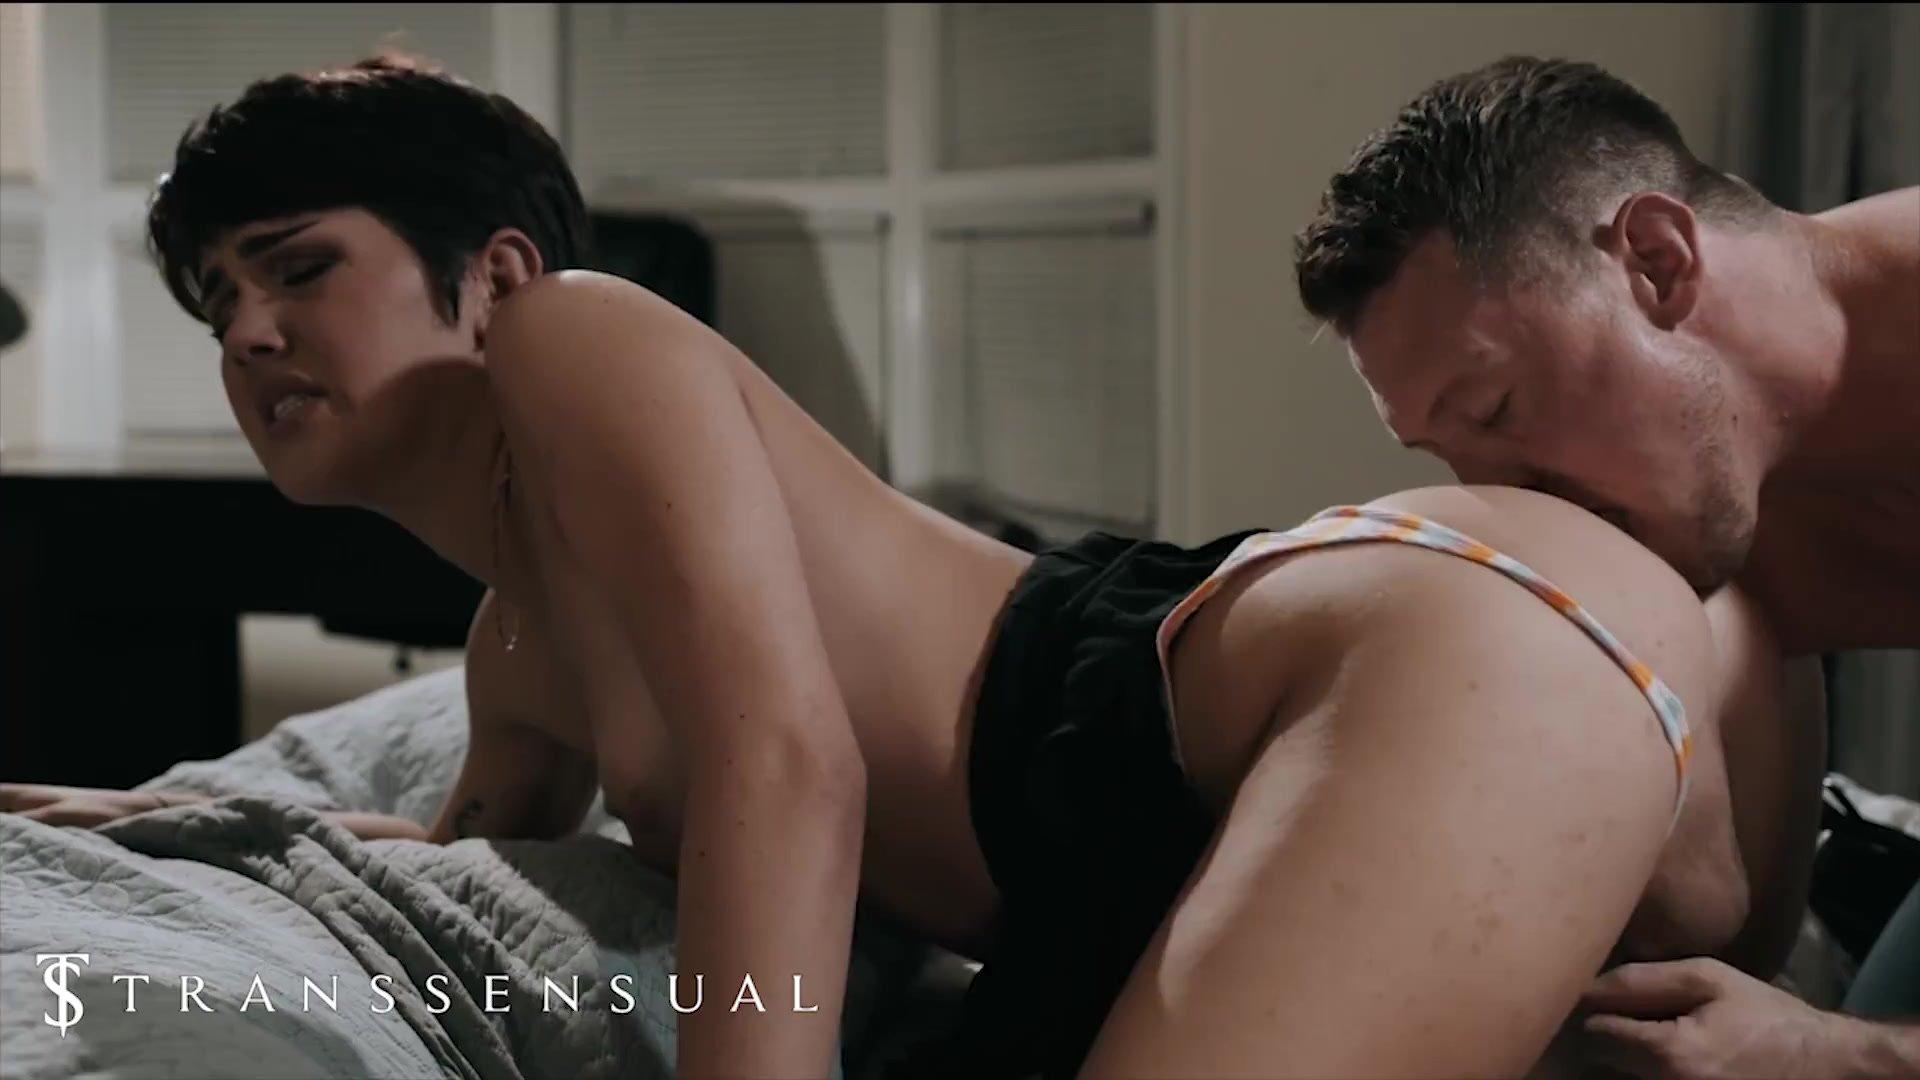 Trans Sensual - Hot Babe Tranny Daisy Taylor Sucks A Big Cock & Get Fucked